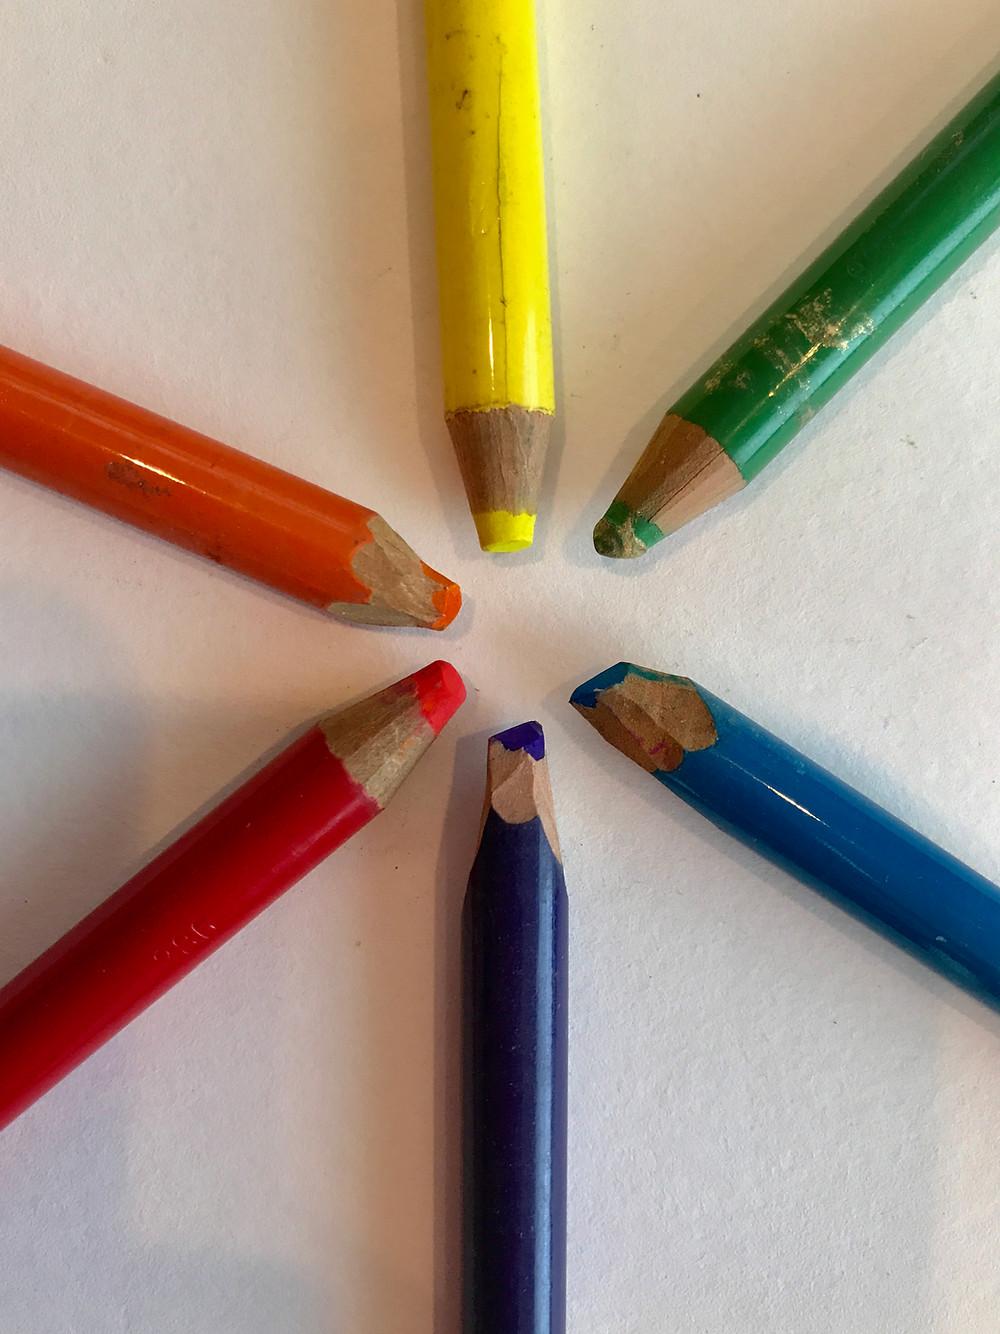 Color pencil color wheel by Kate Moynihan